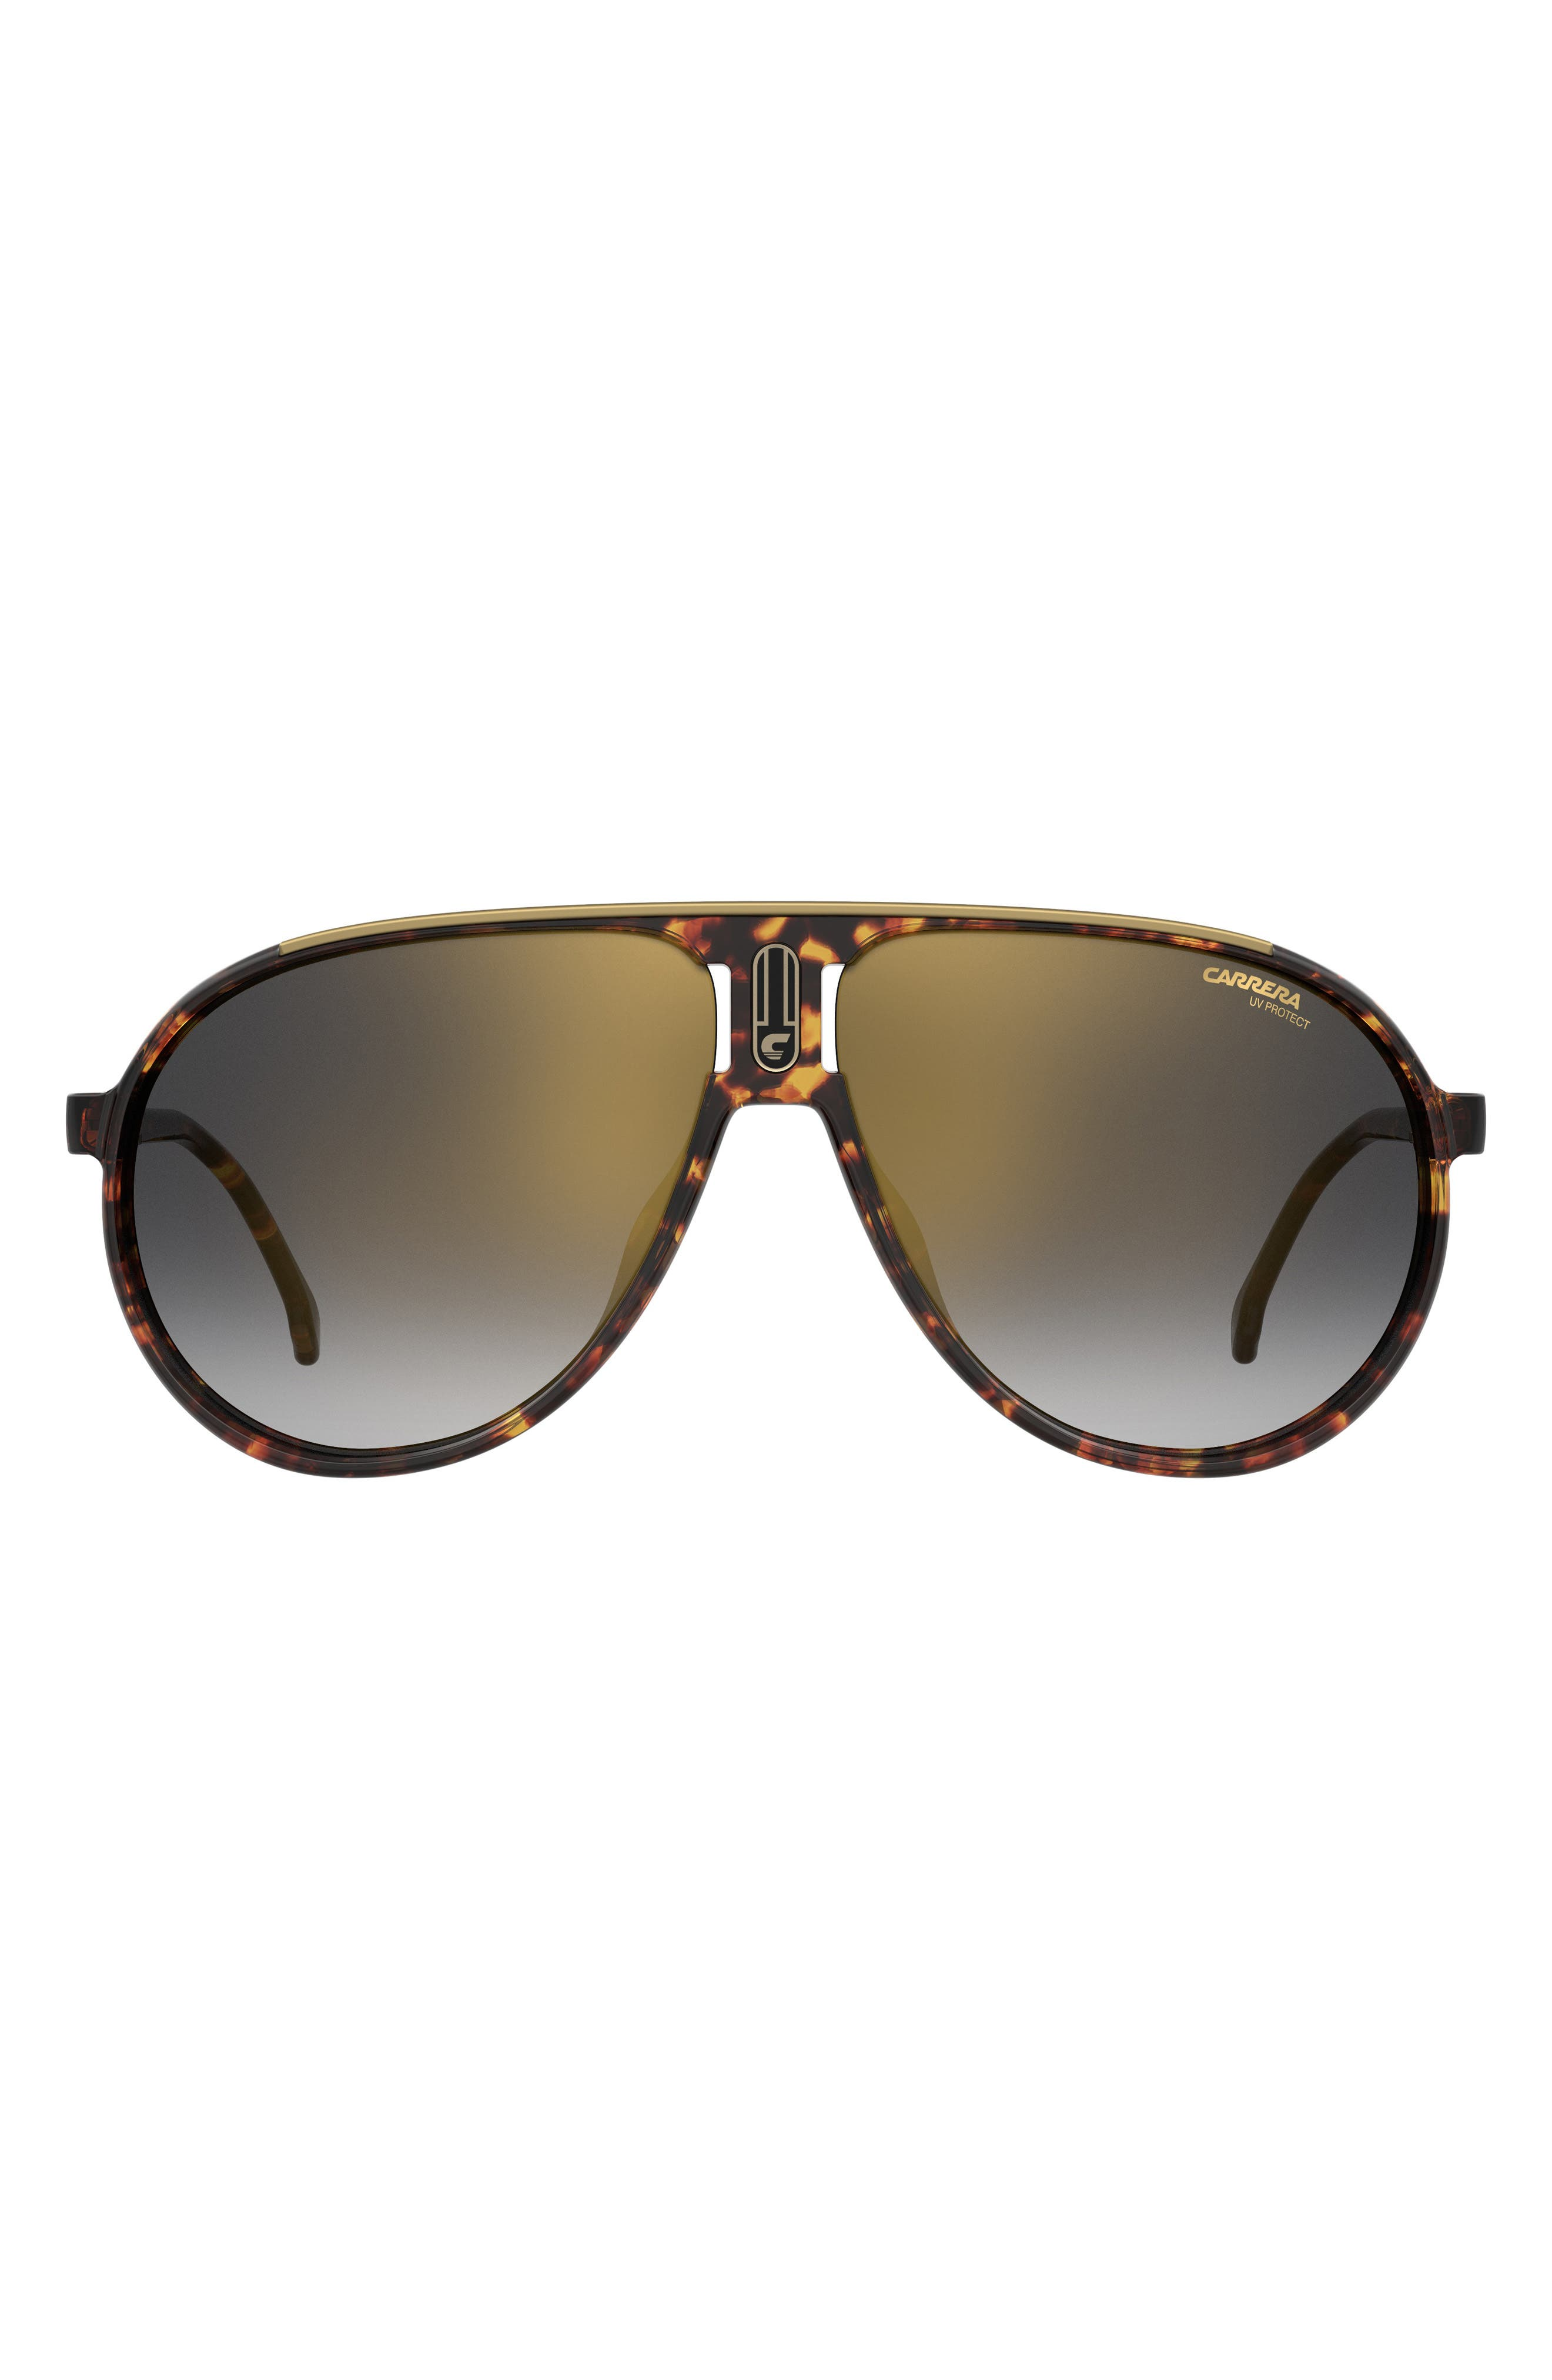 Champions 62mm Aviator Sunglasses